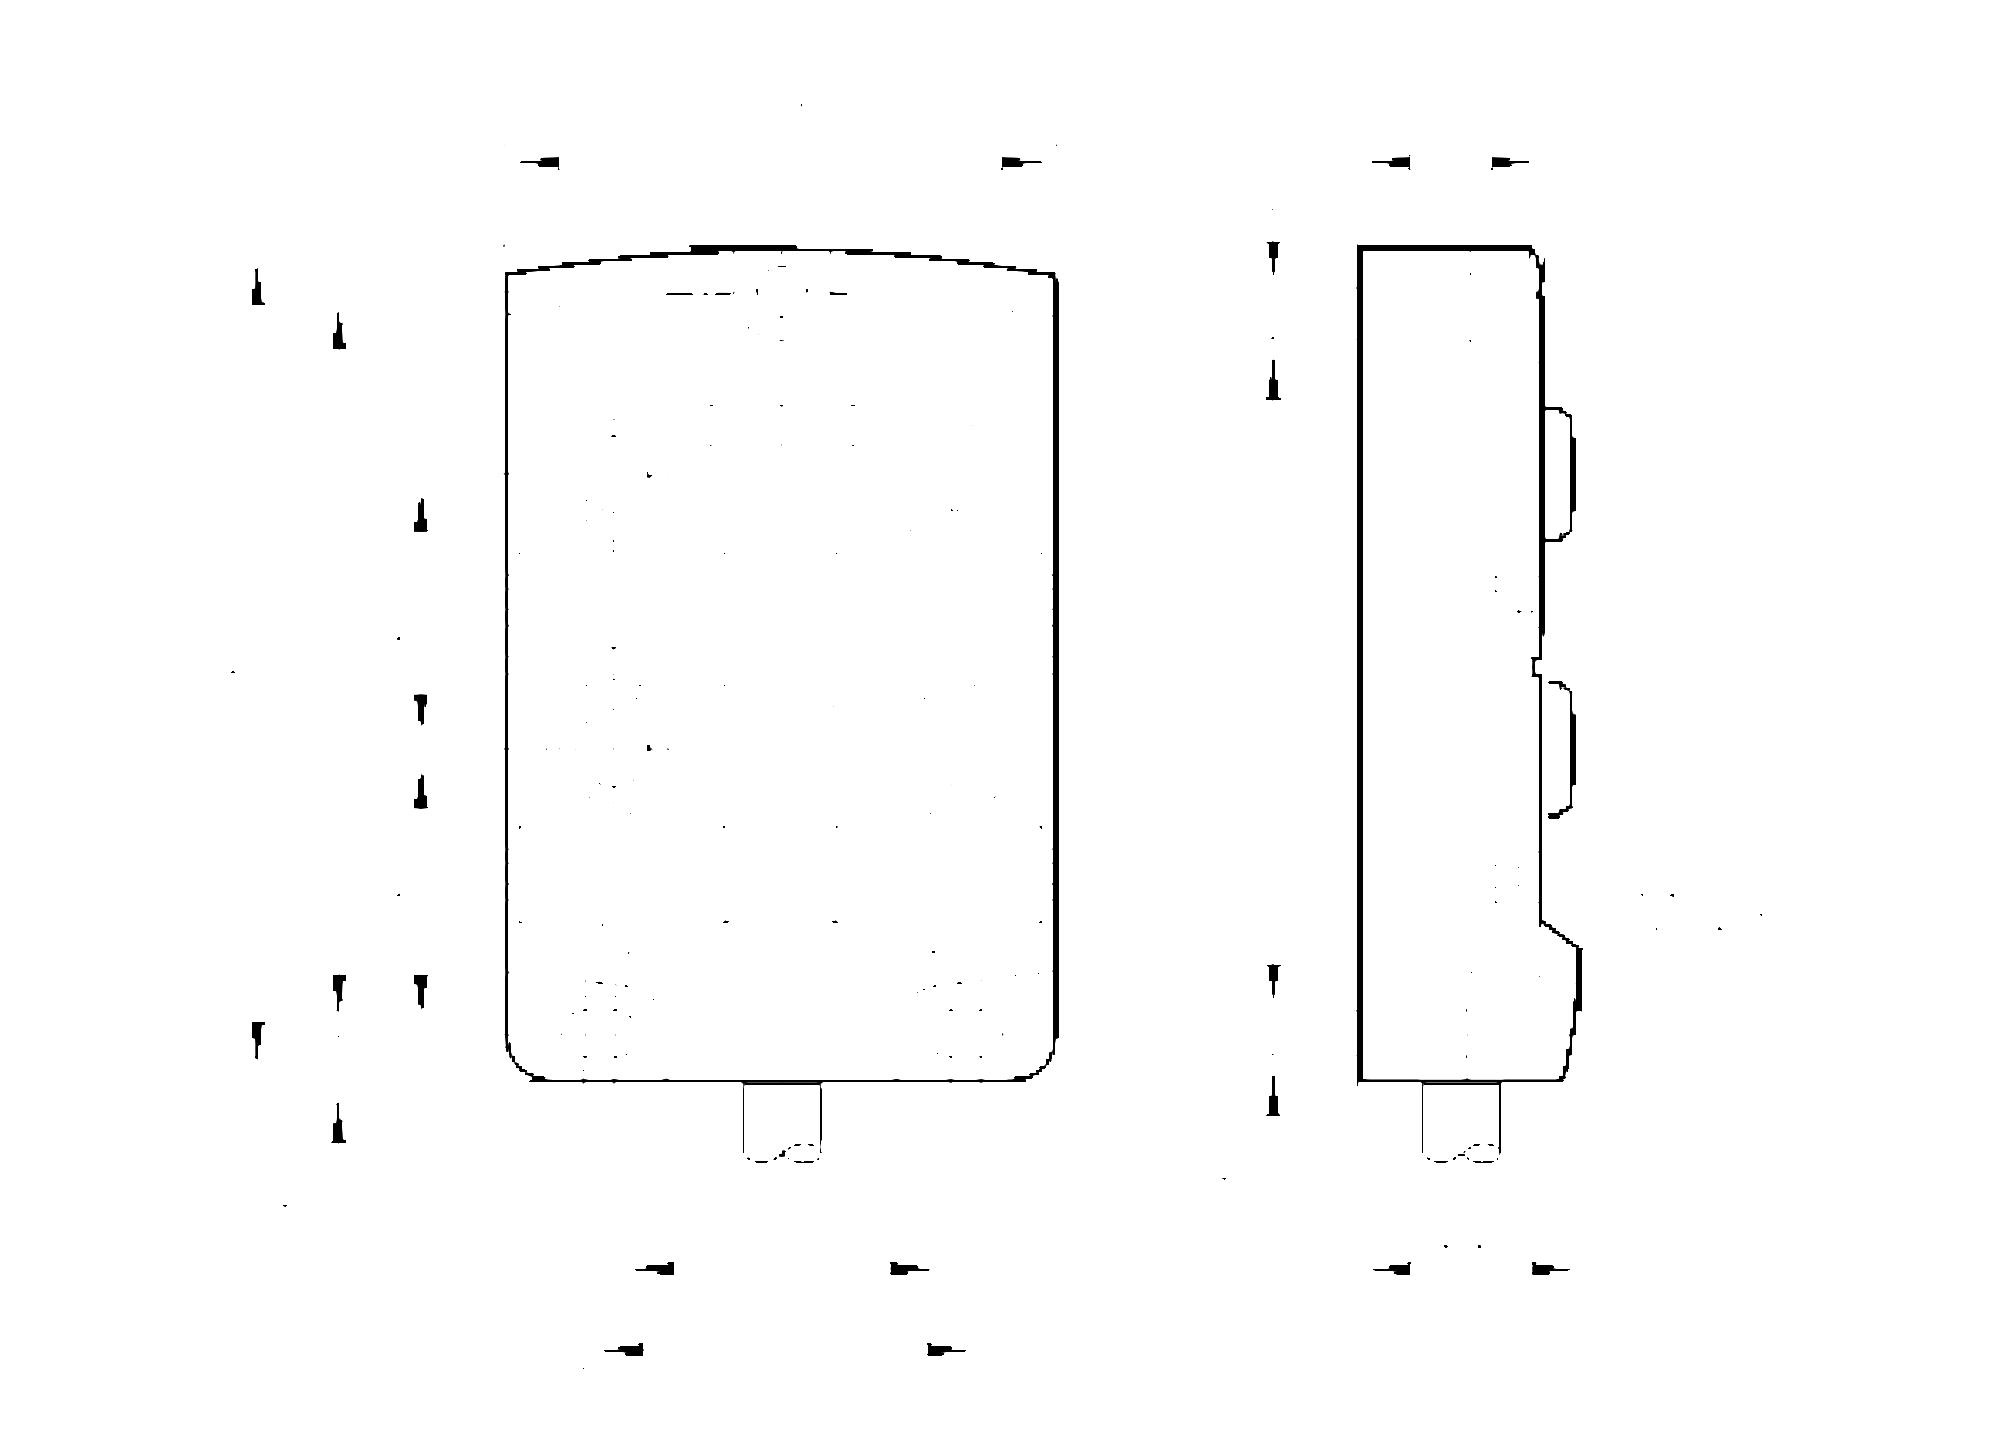 ebc027 - wiring block